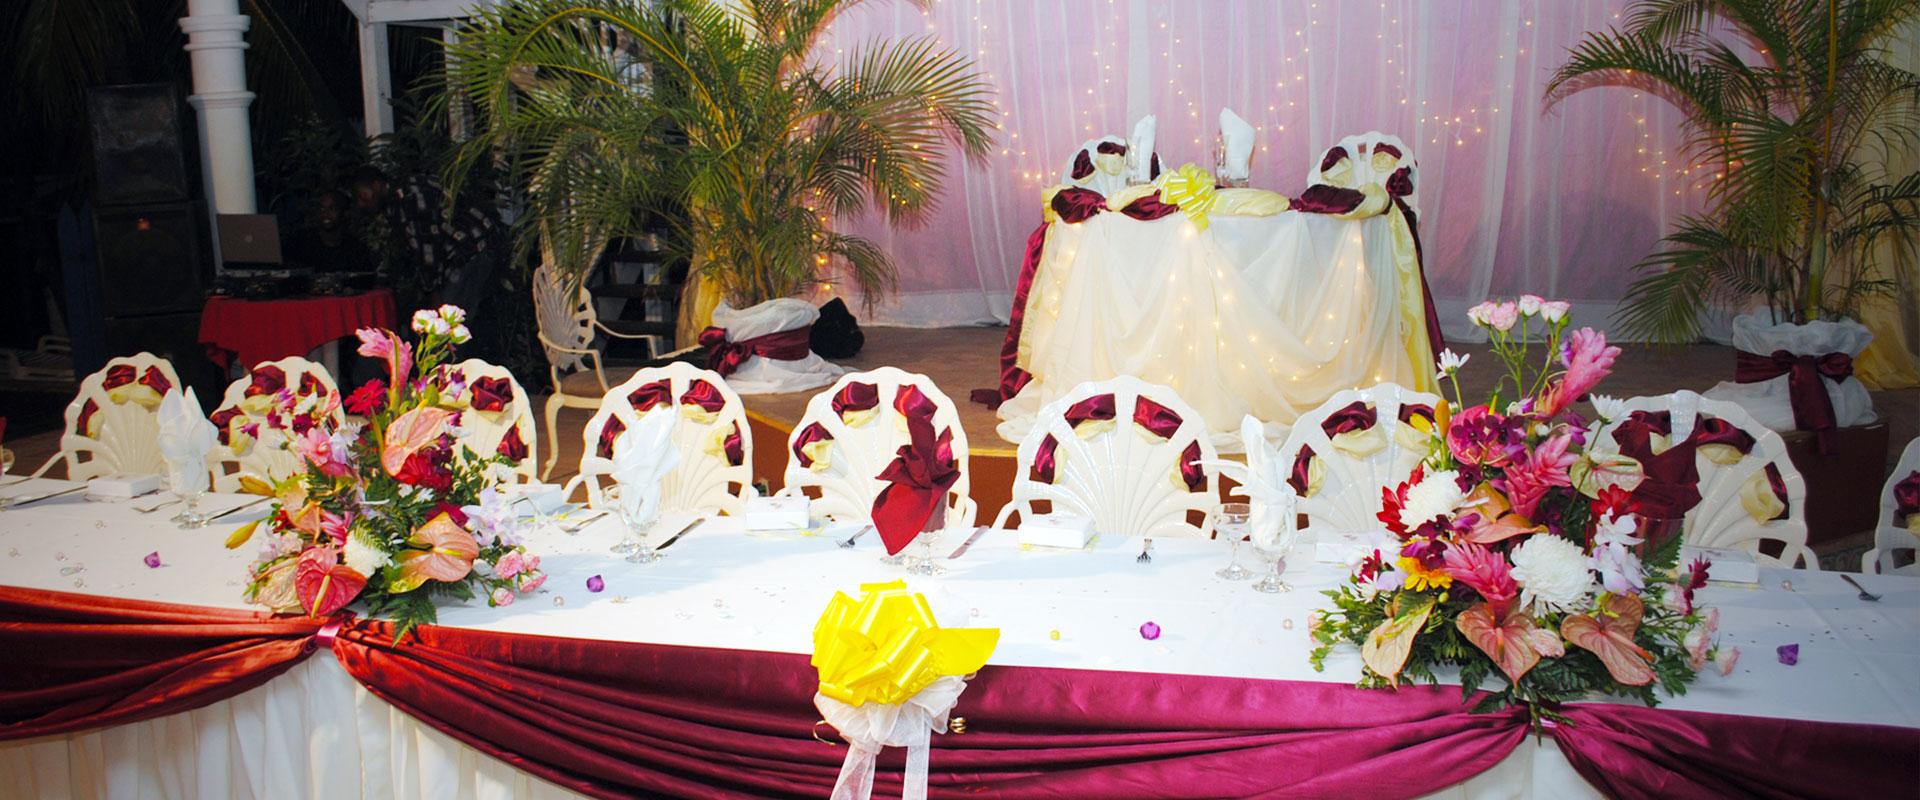 Wedding Reception by Faithful Wedding Services